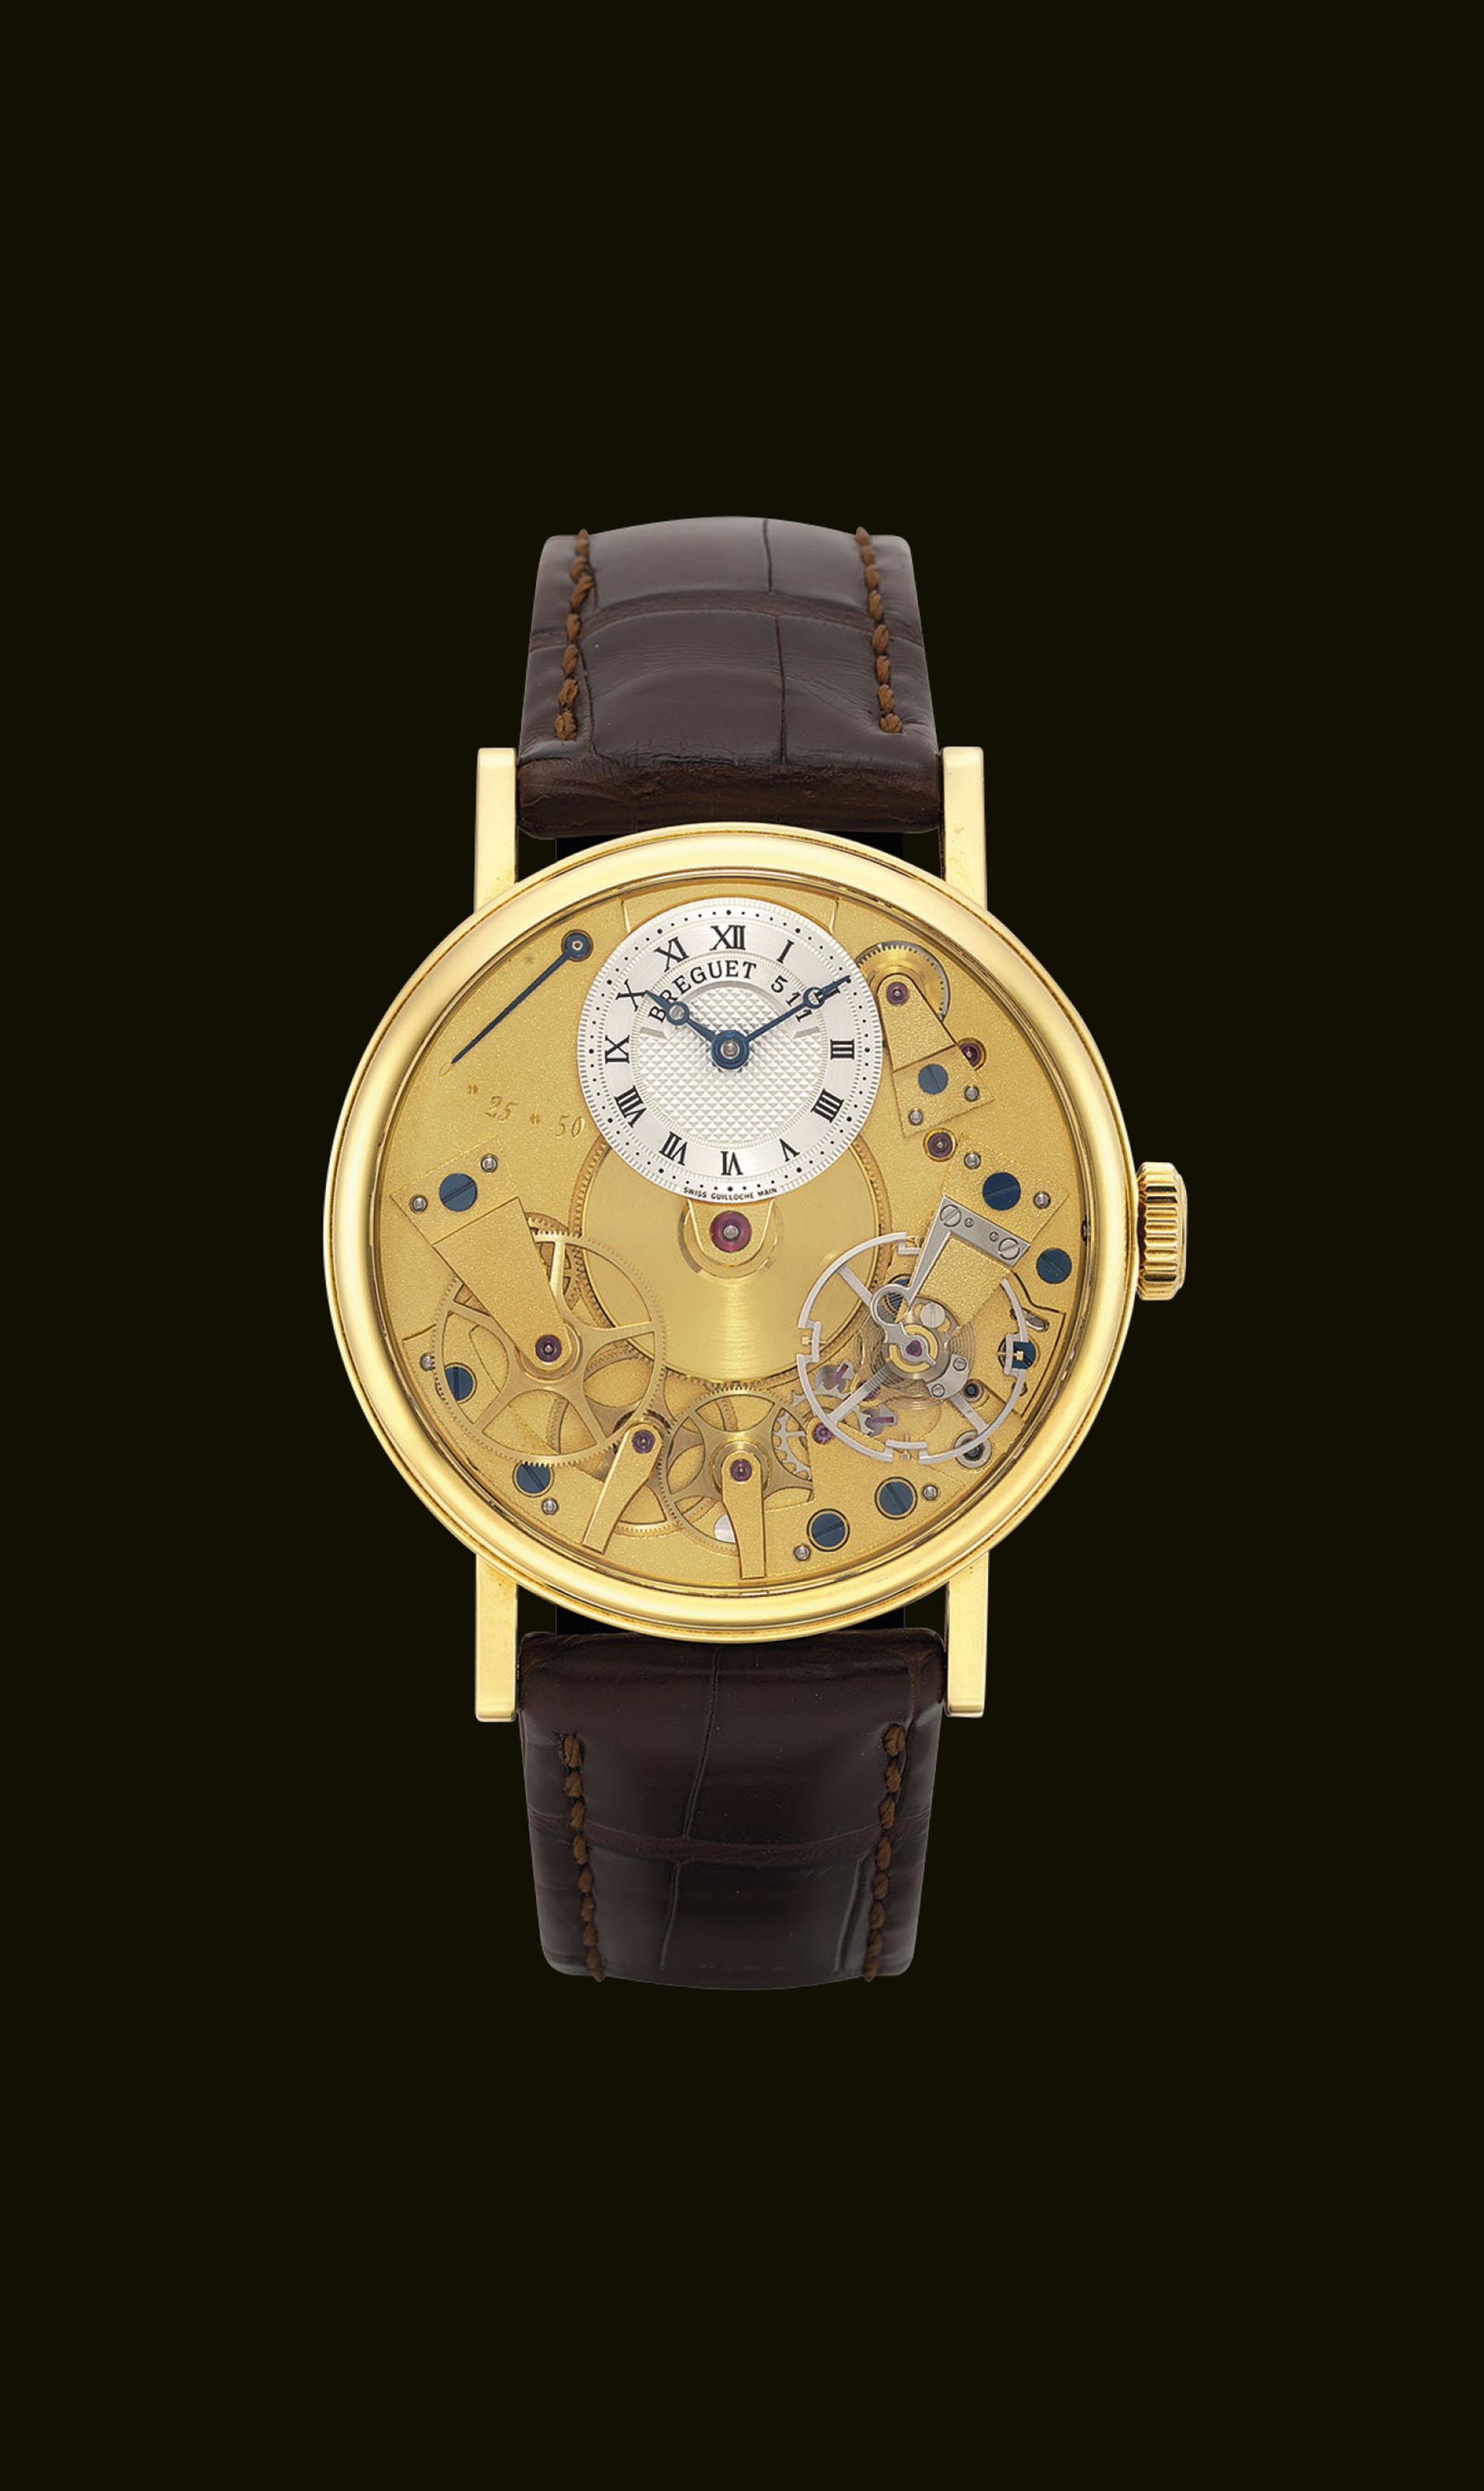 BREGUET. A FINE 18K GOLD SEMI-